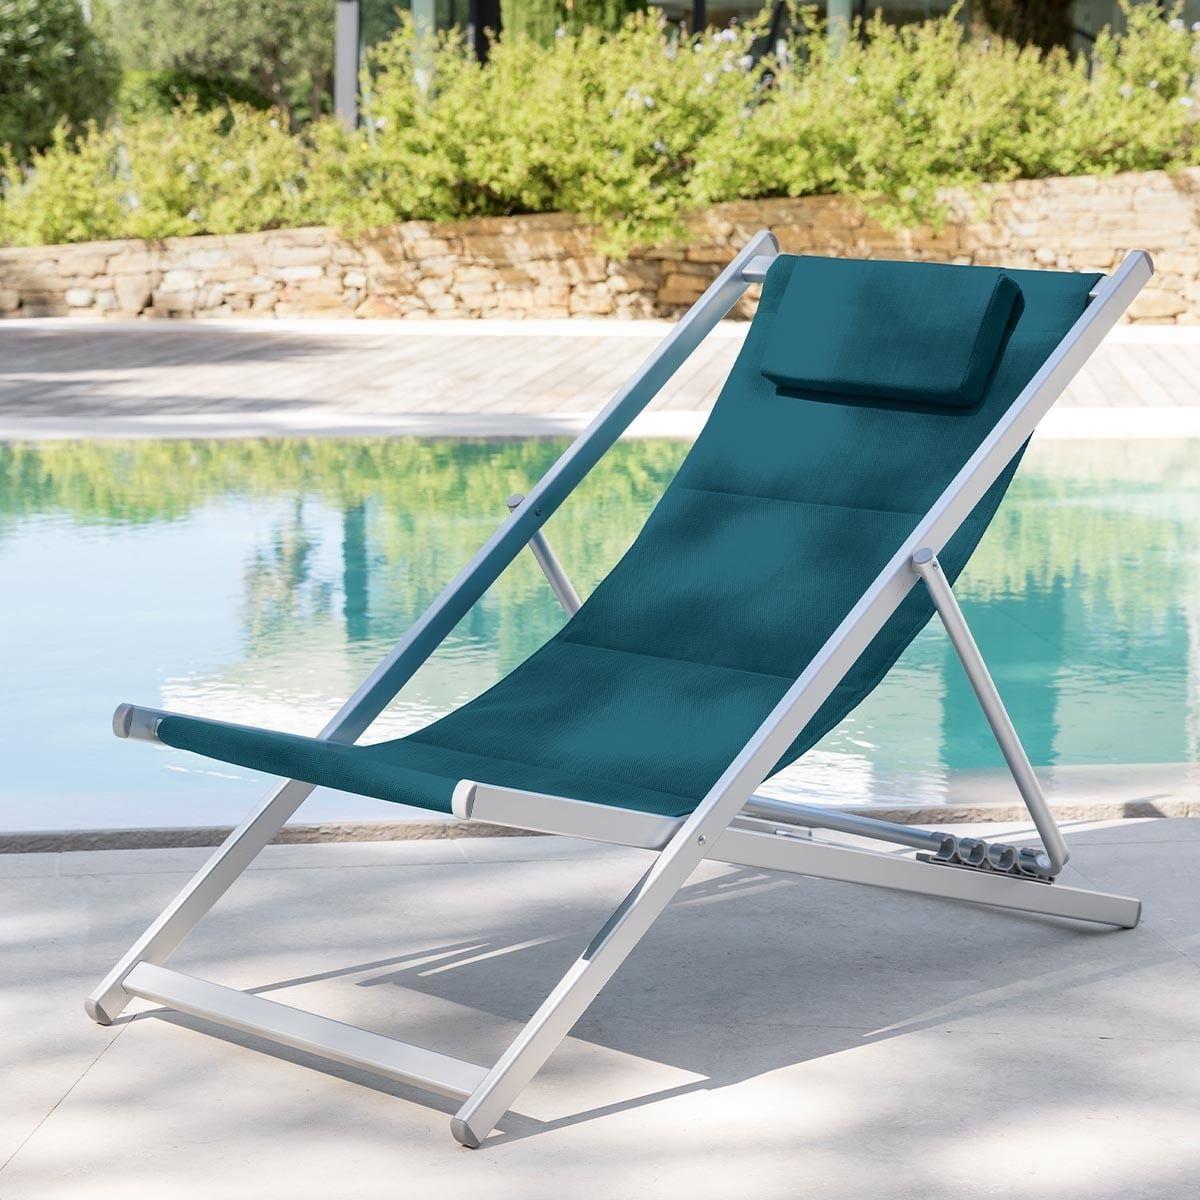 Chilienne De Jardin Honolulu Bleu Canard En 2020 Chaise Longue Pliante Hamac Balancelle Mobilier De Jardin Design